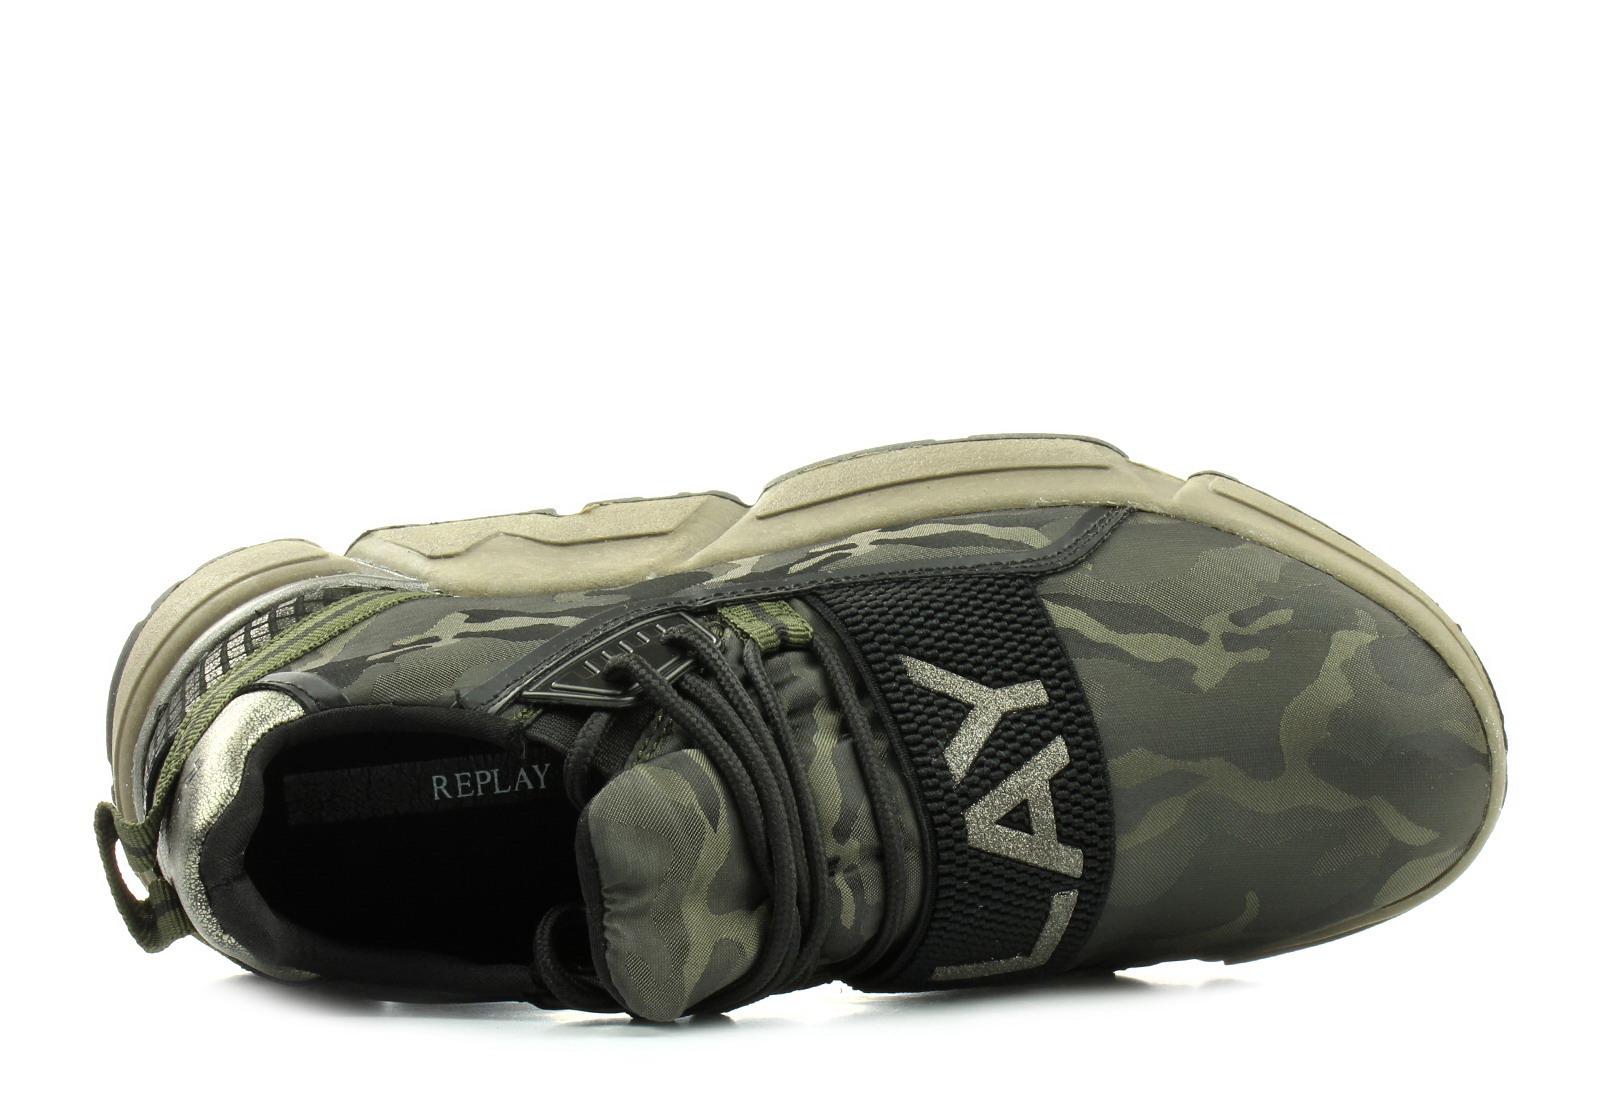 Replay Cipő - Rs950004s - RS950004S-2138 - Office Shoes Magyarország bde79a5d22